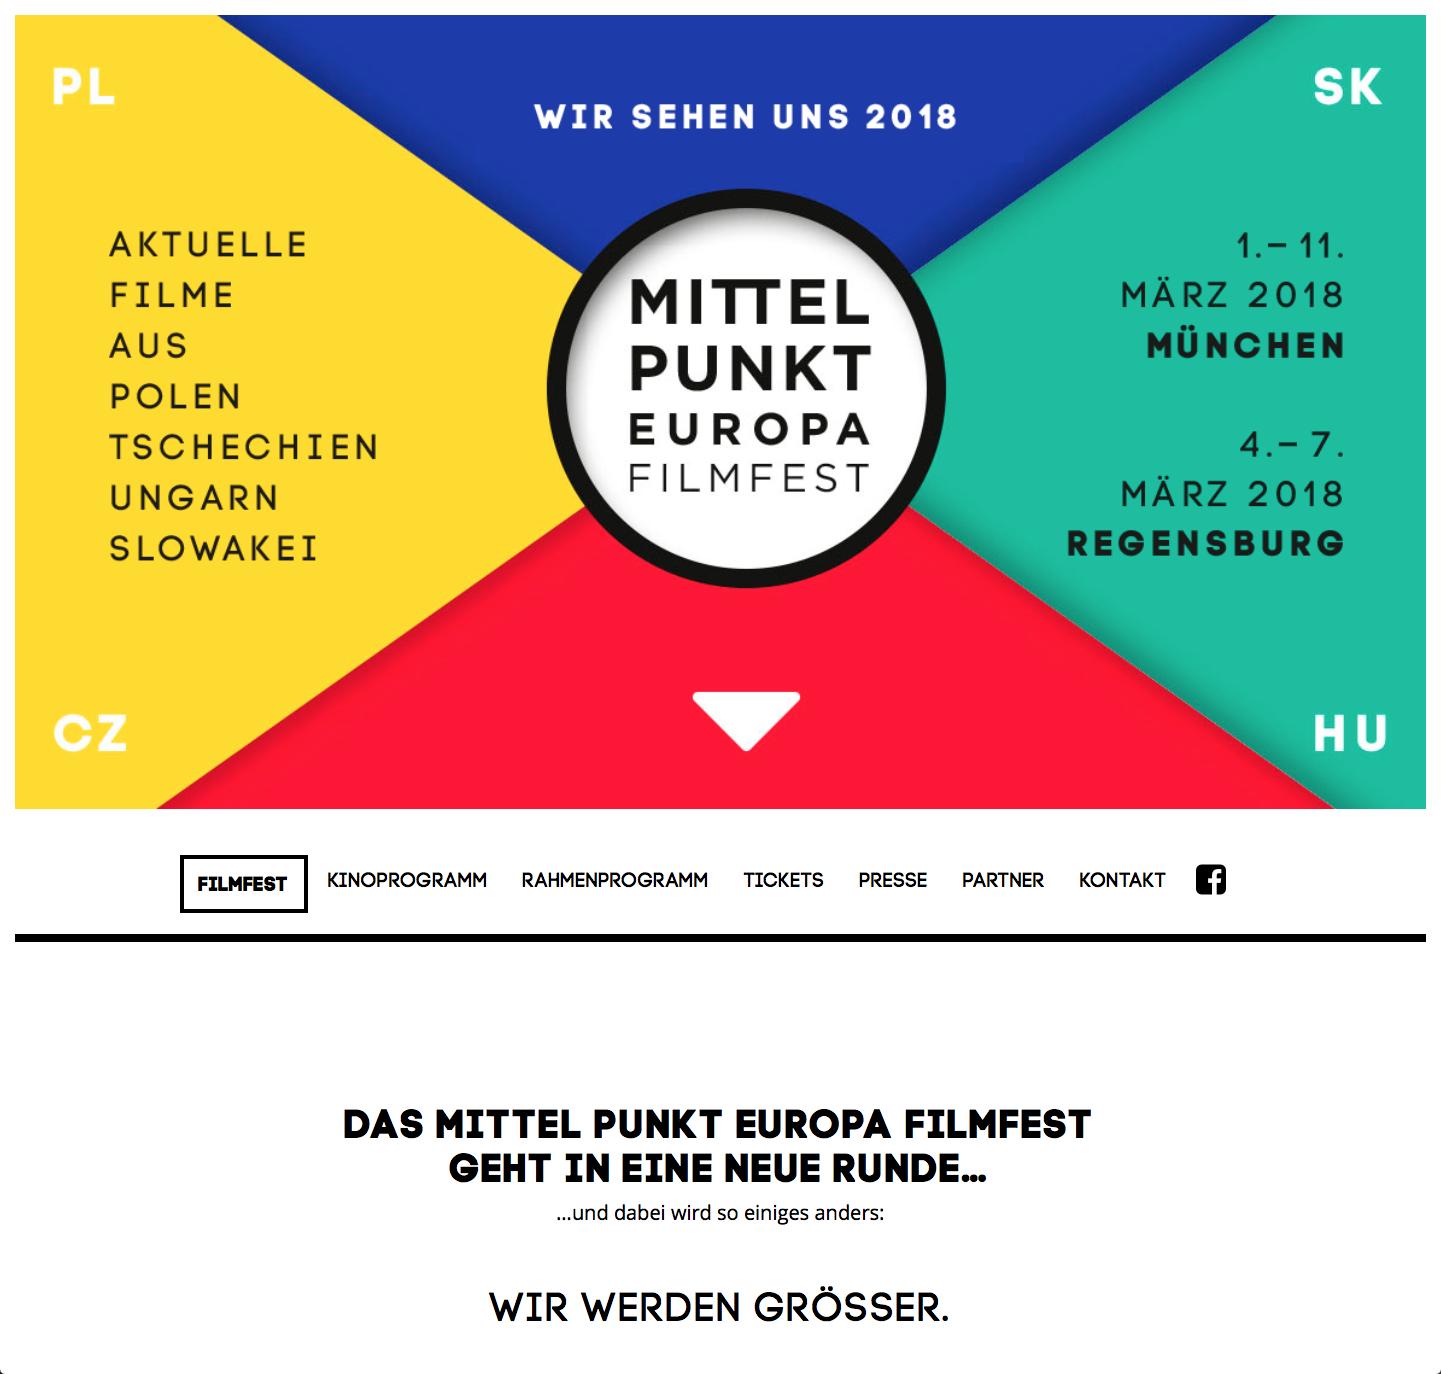 one-page Mittelpunkt Europa